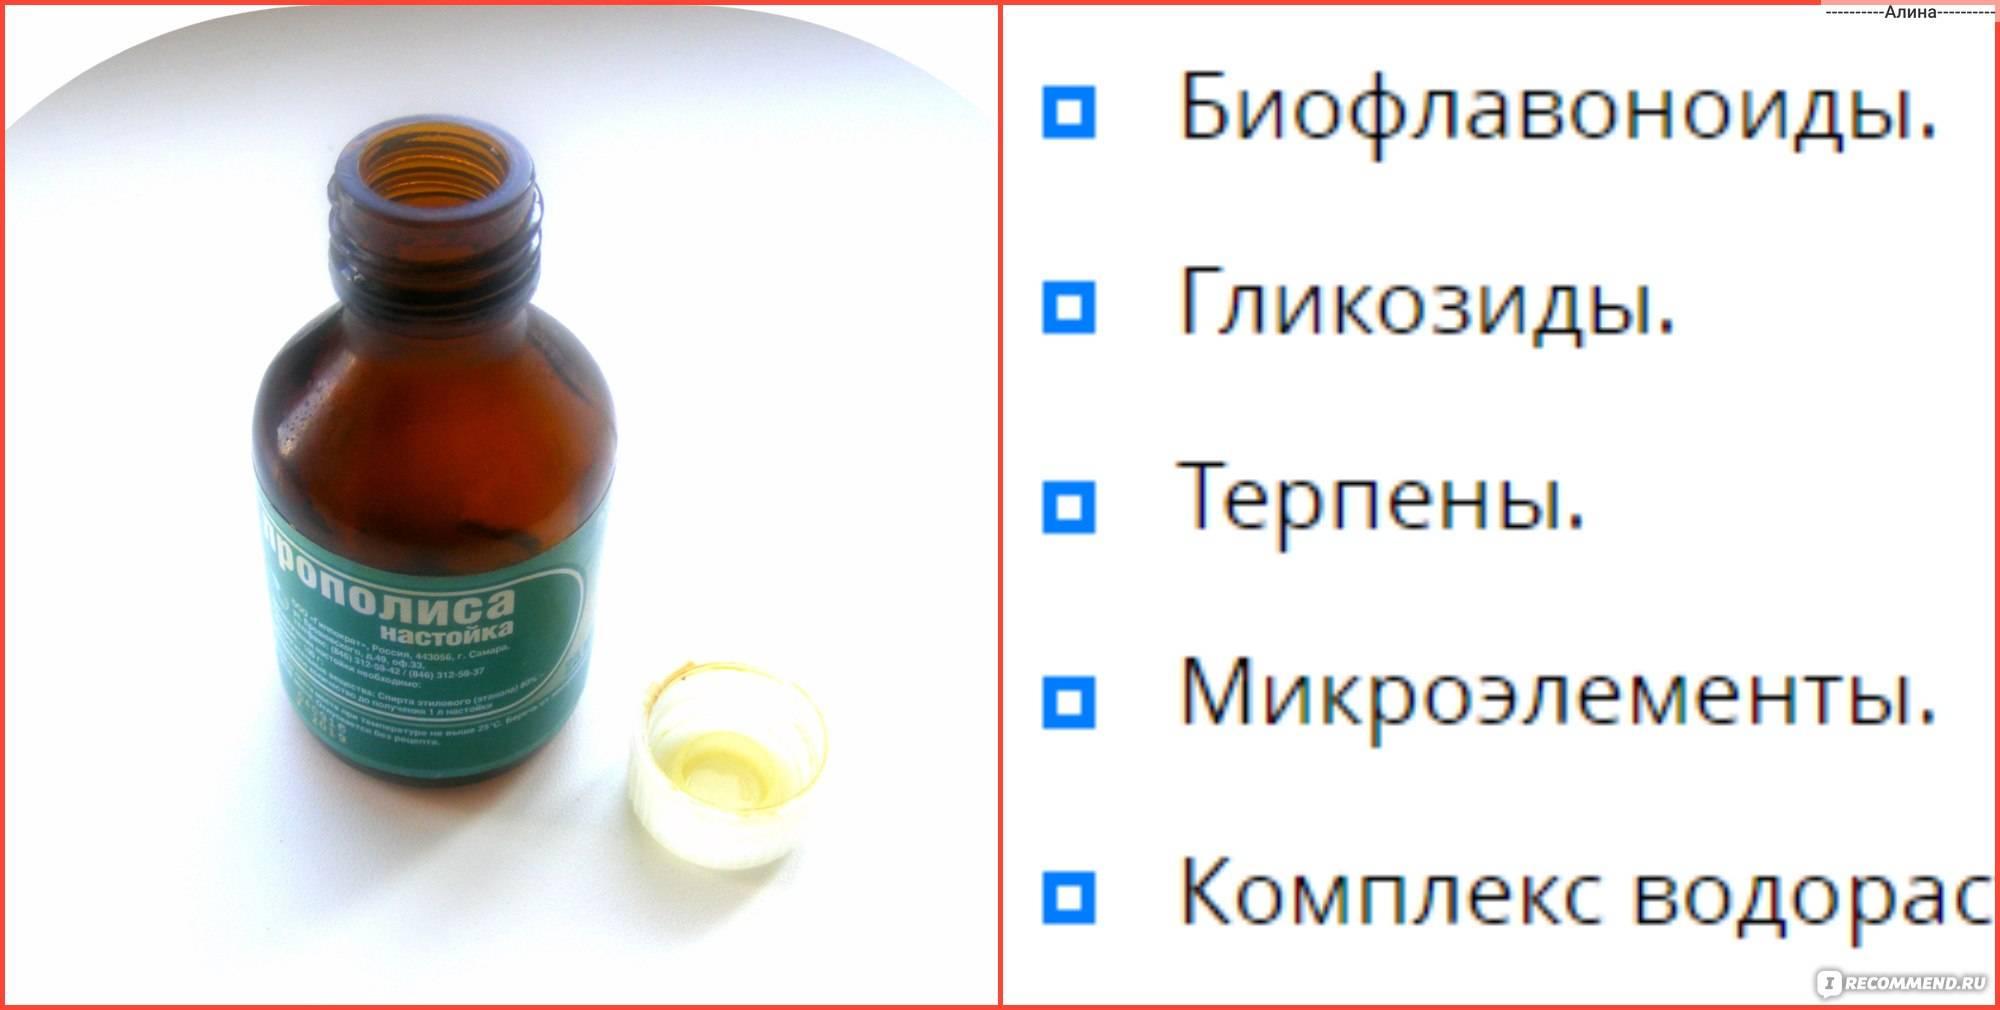 Лечение панкреатита молоком и прополисом